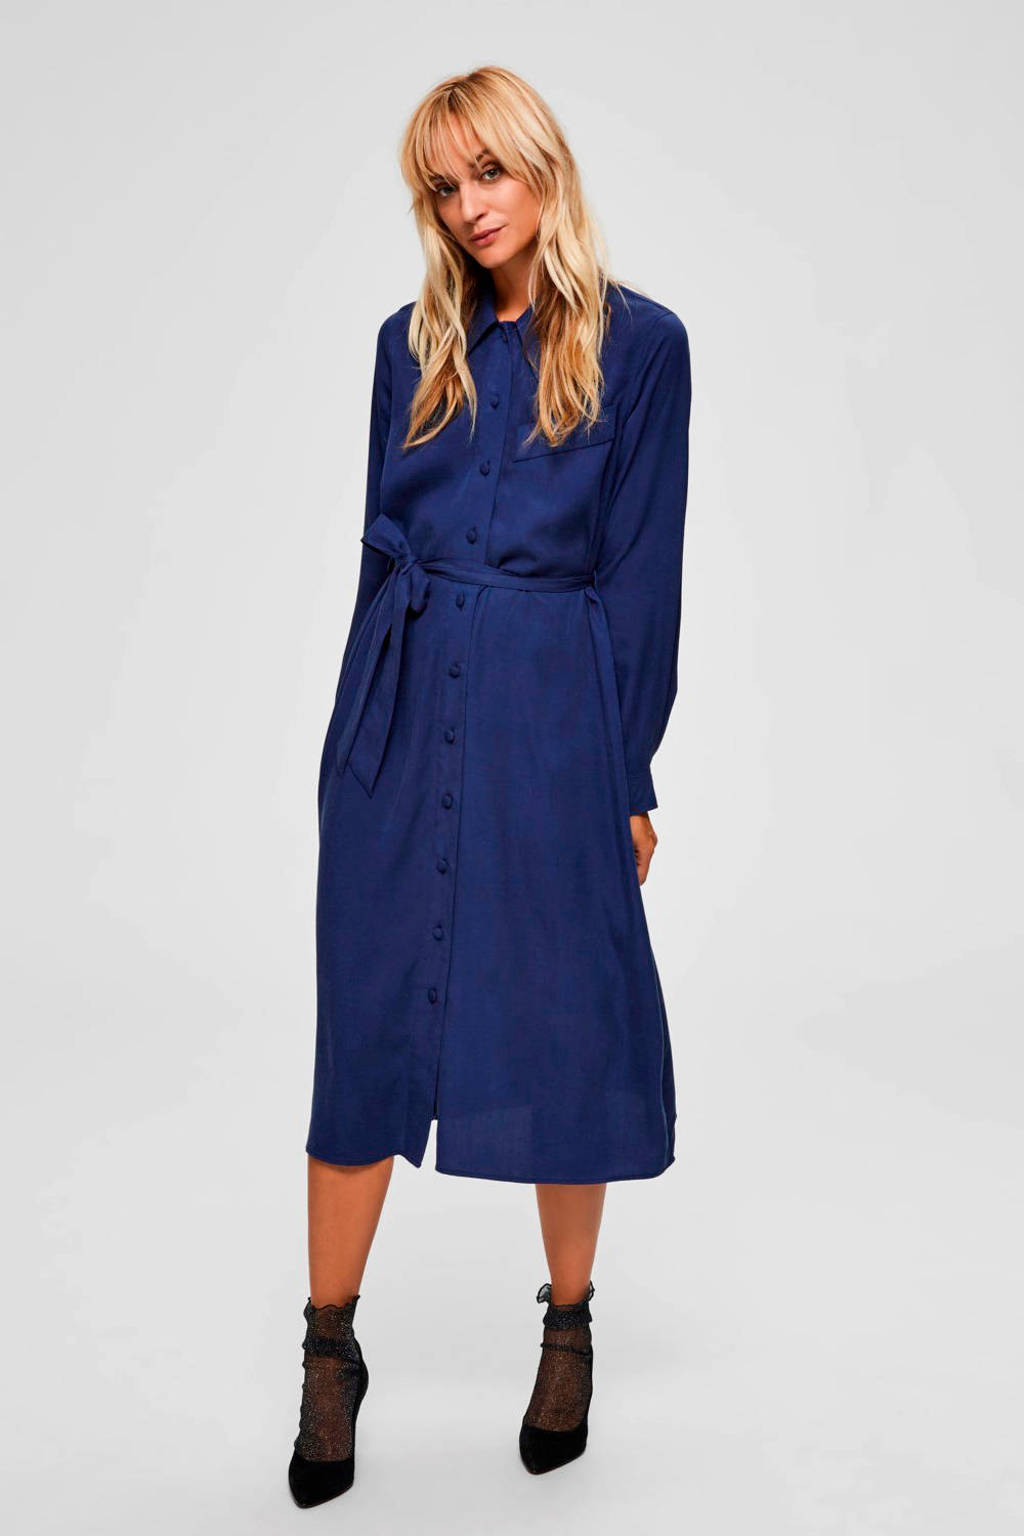 SELECTED FEMME blousejurk met ceintuur blauw, Blauw